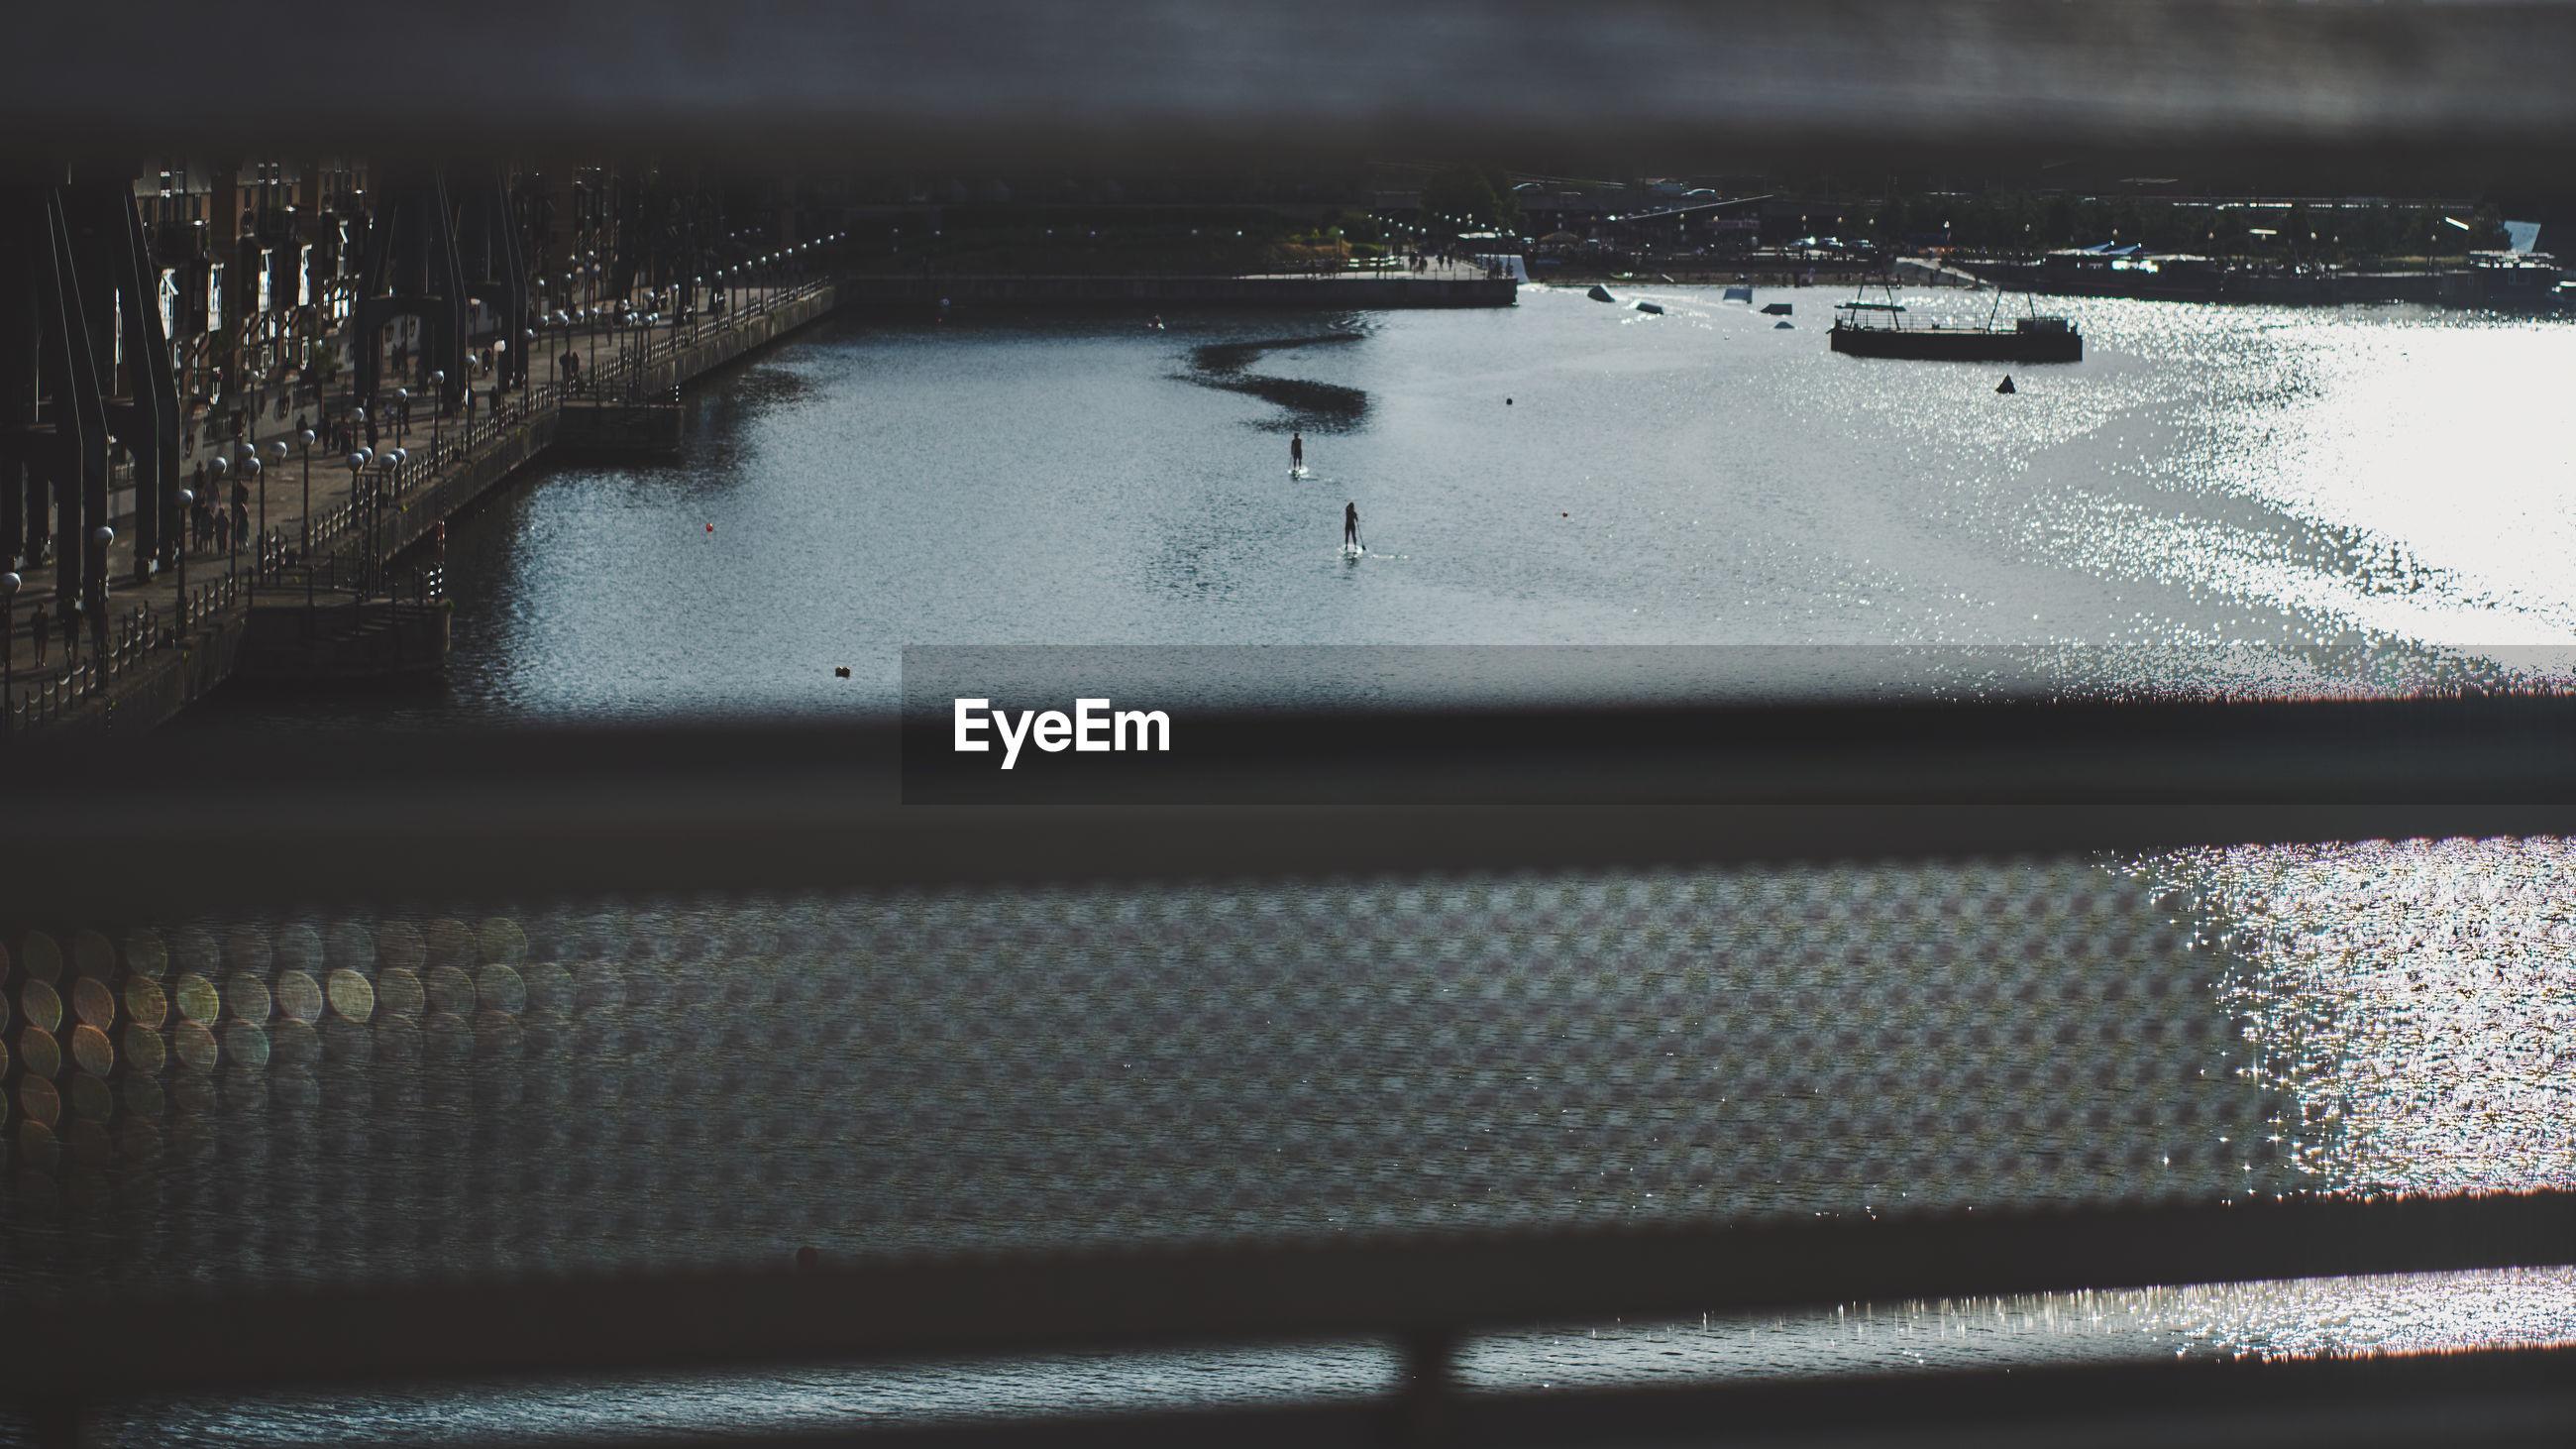 SCENIC VIEW OF RIVER IN WINTER